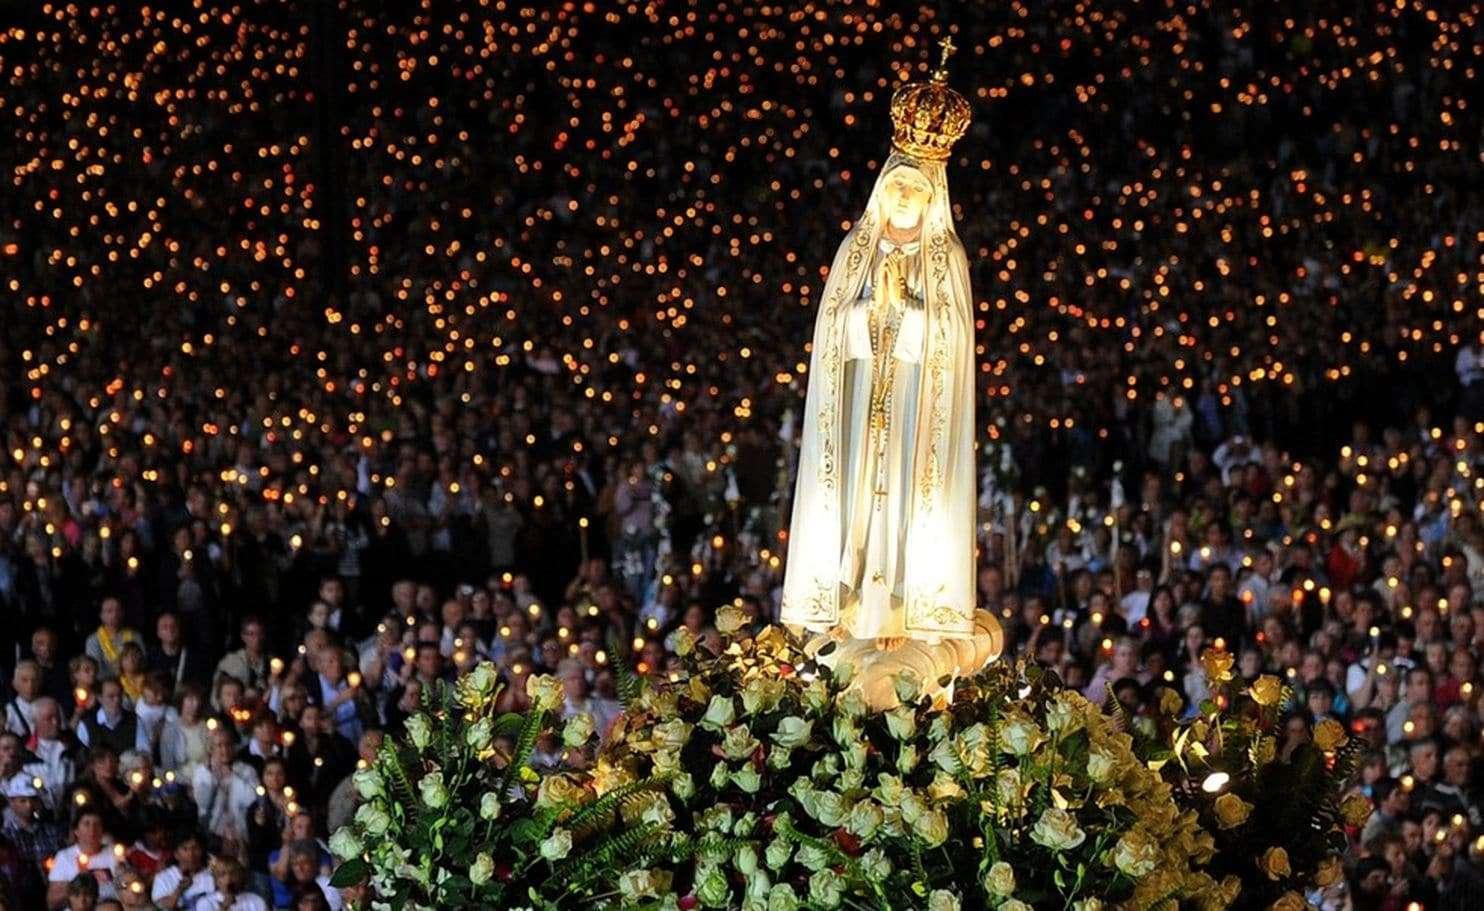 Third Secret of Fatima: The Best-Kept Secret of the 20th Century